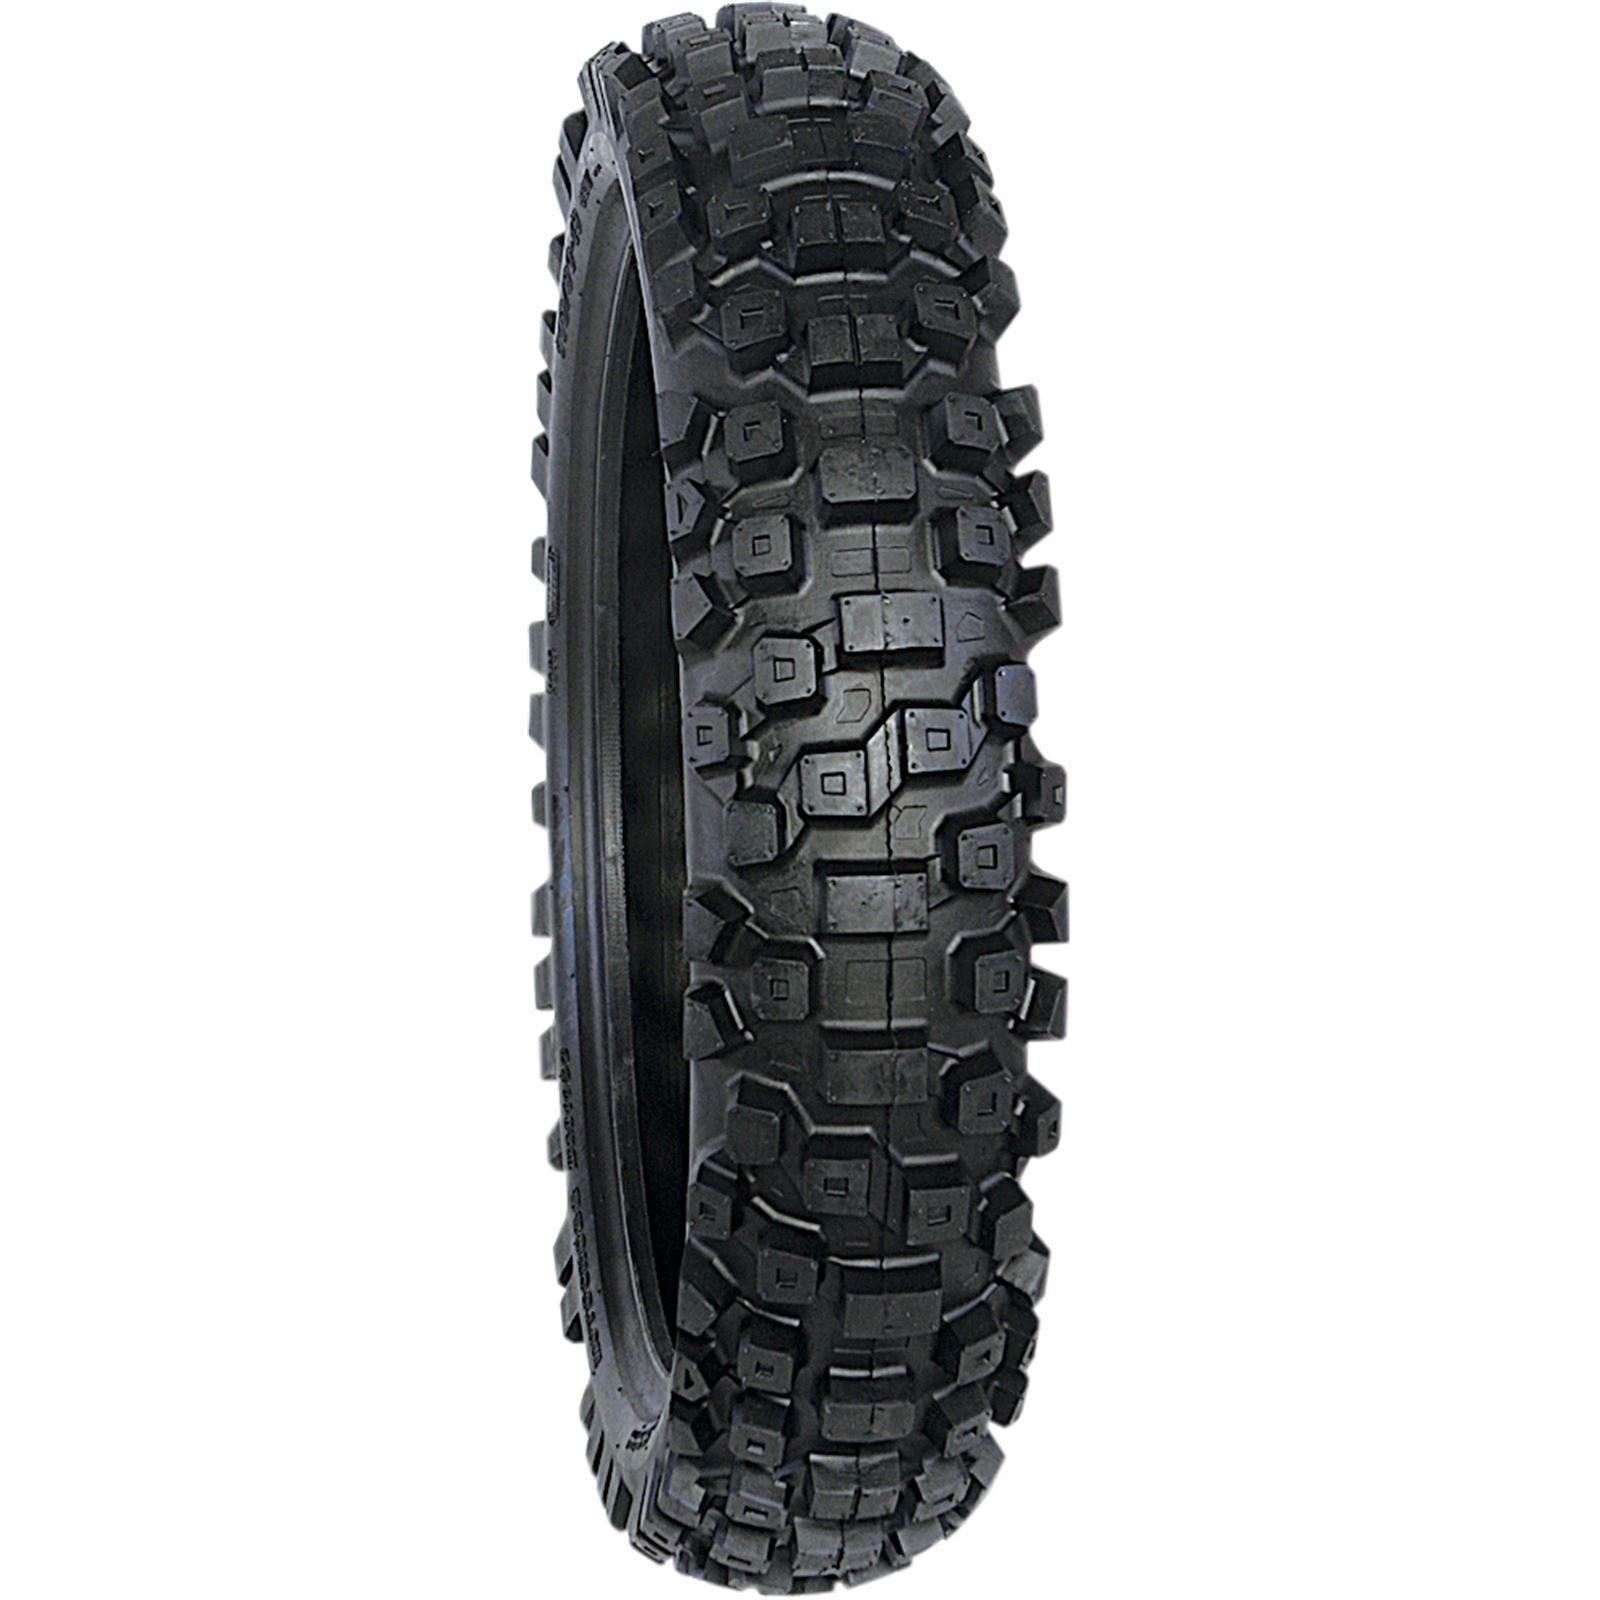 Duro Tire Tire - DM1153 - 110/90-19 4PR